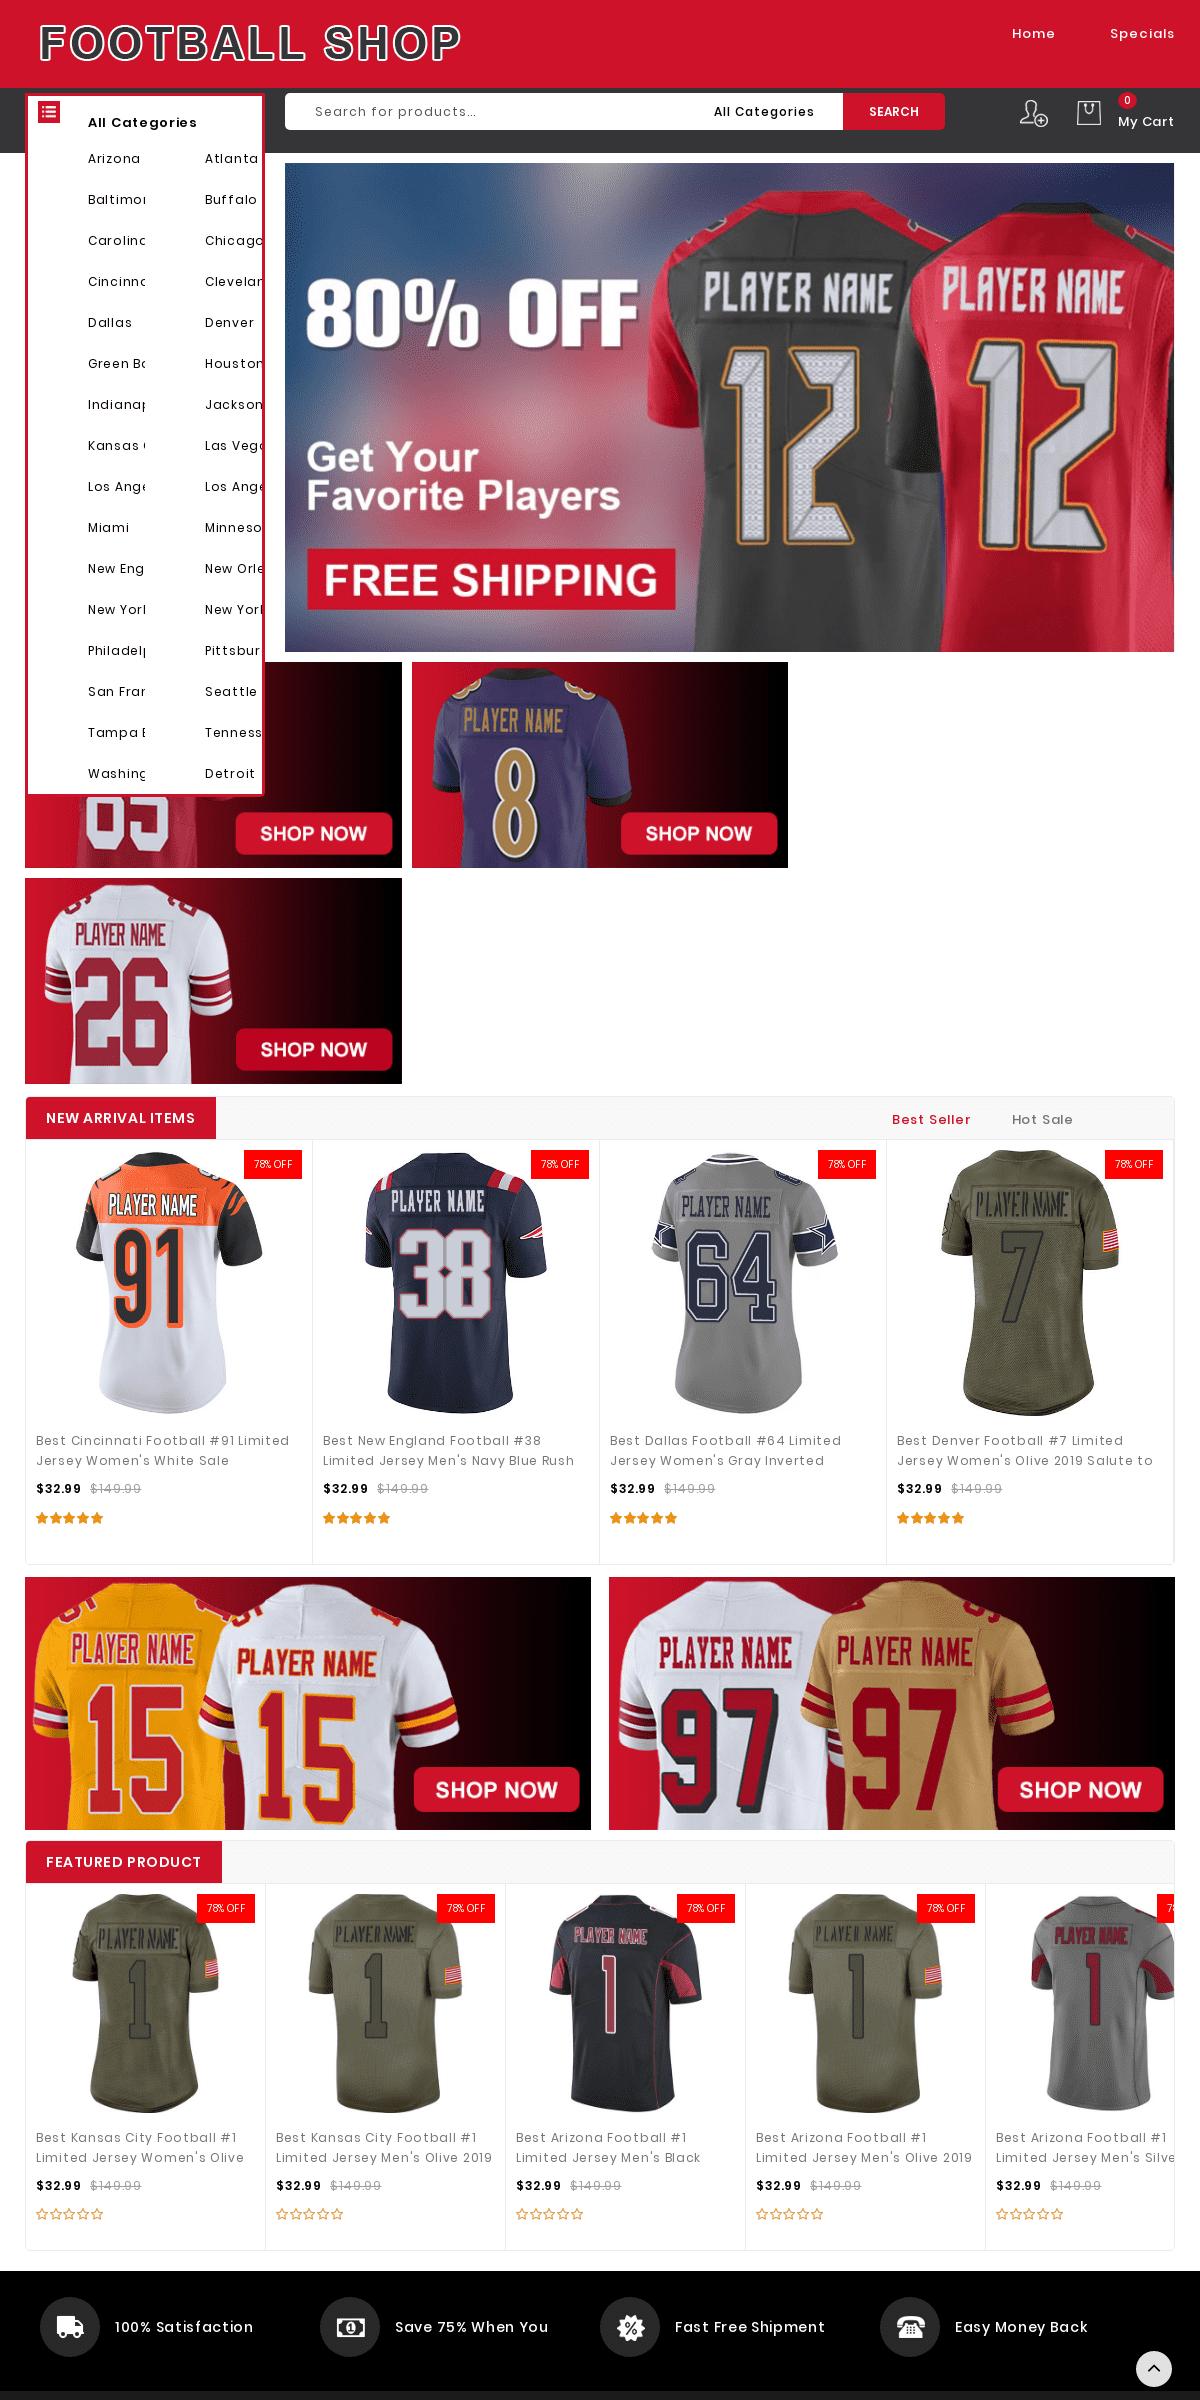 Sale Authentic Football Jerseys - Official Cheap Football Jerseys Online Store